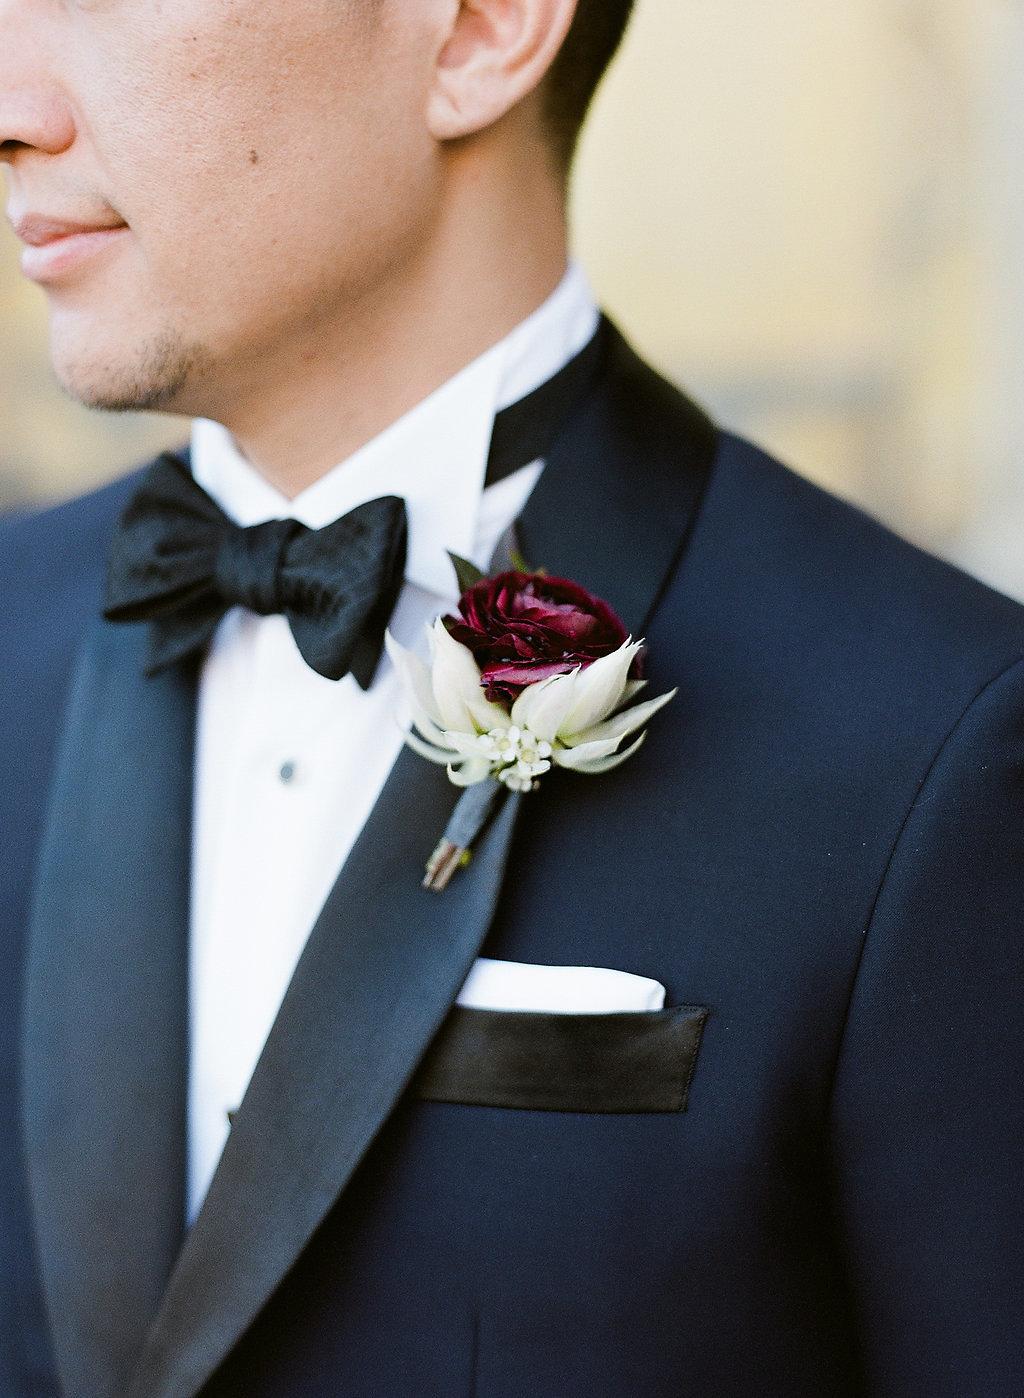 groom-boutonniere-JennySoiPhotography.jpg